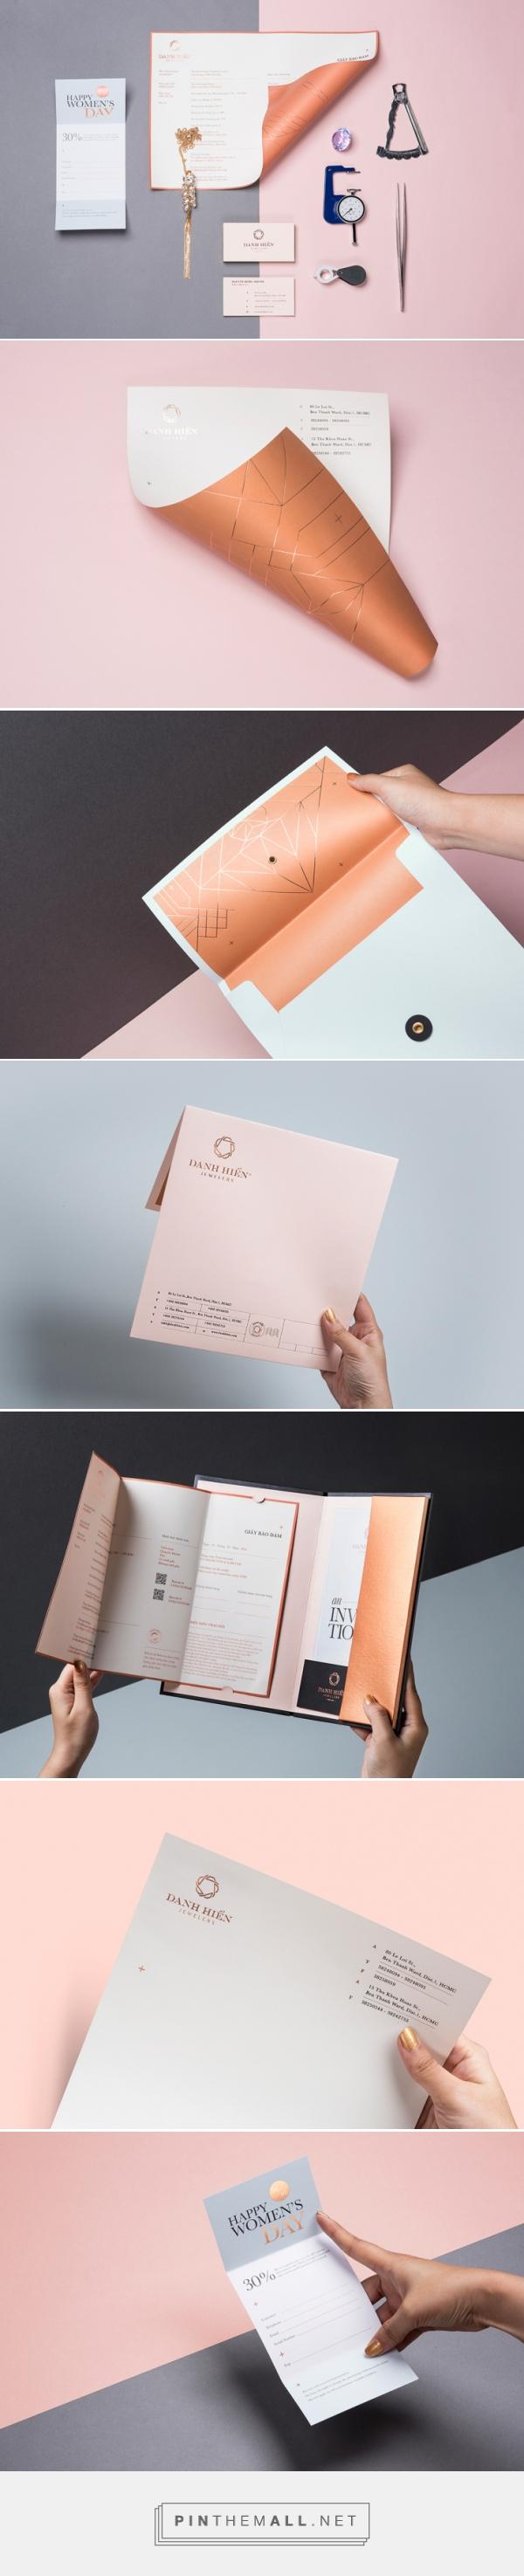 Elegant branding design for Danh Hien Jewelers